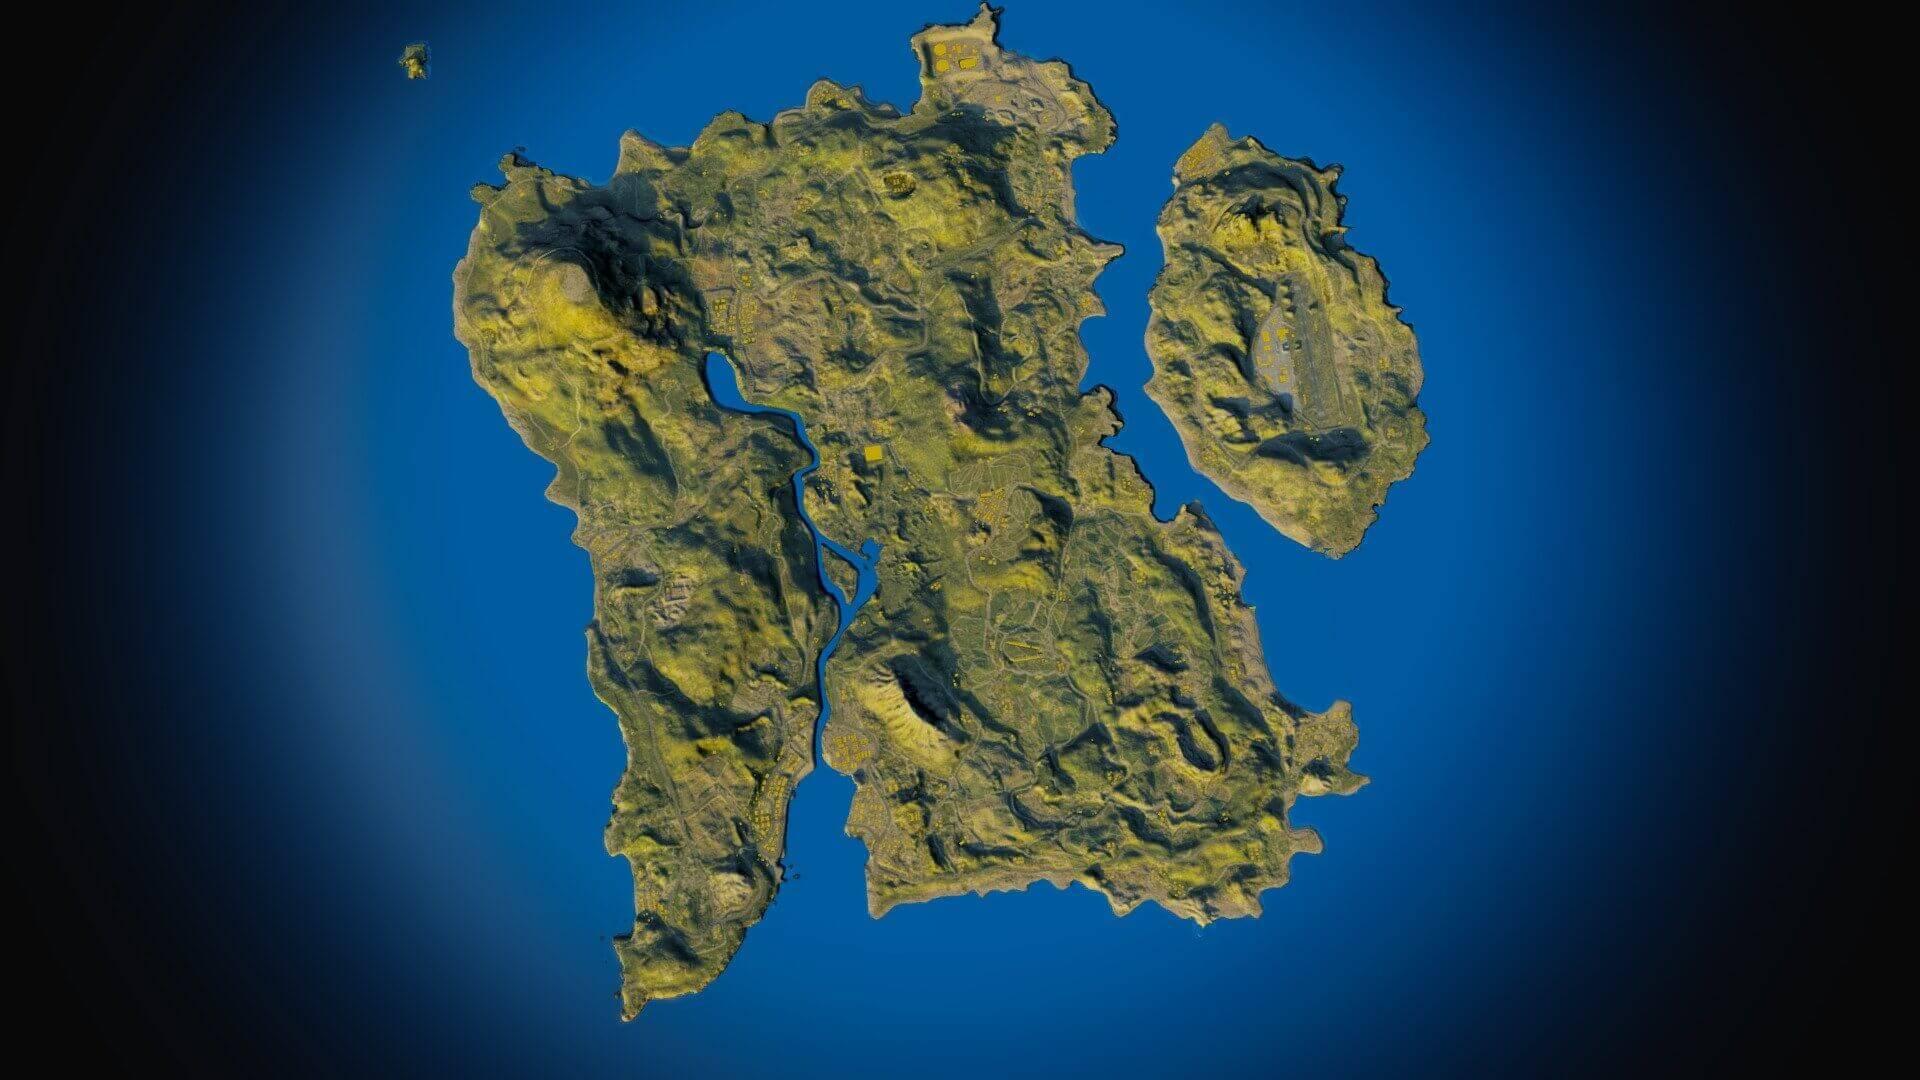 Pubg erangel map hd image download